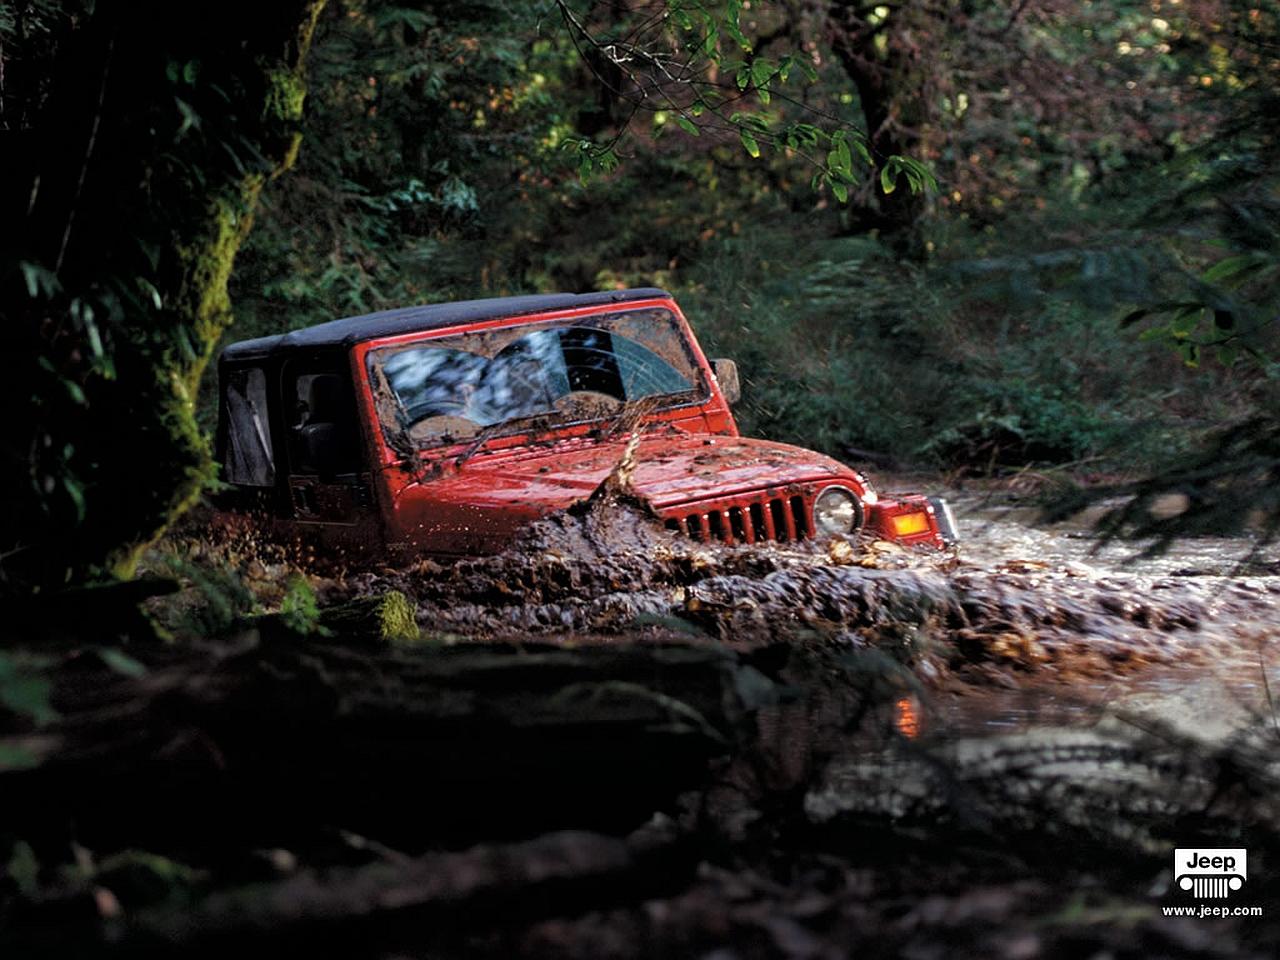 Vehicles - Jeep Wallpaper